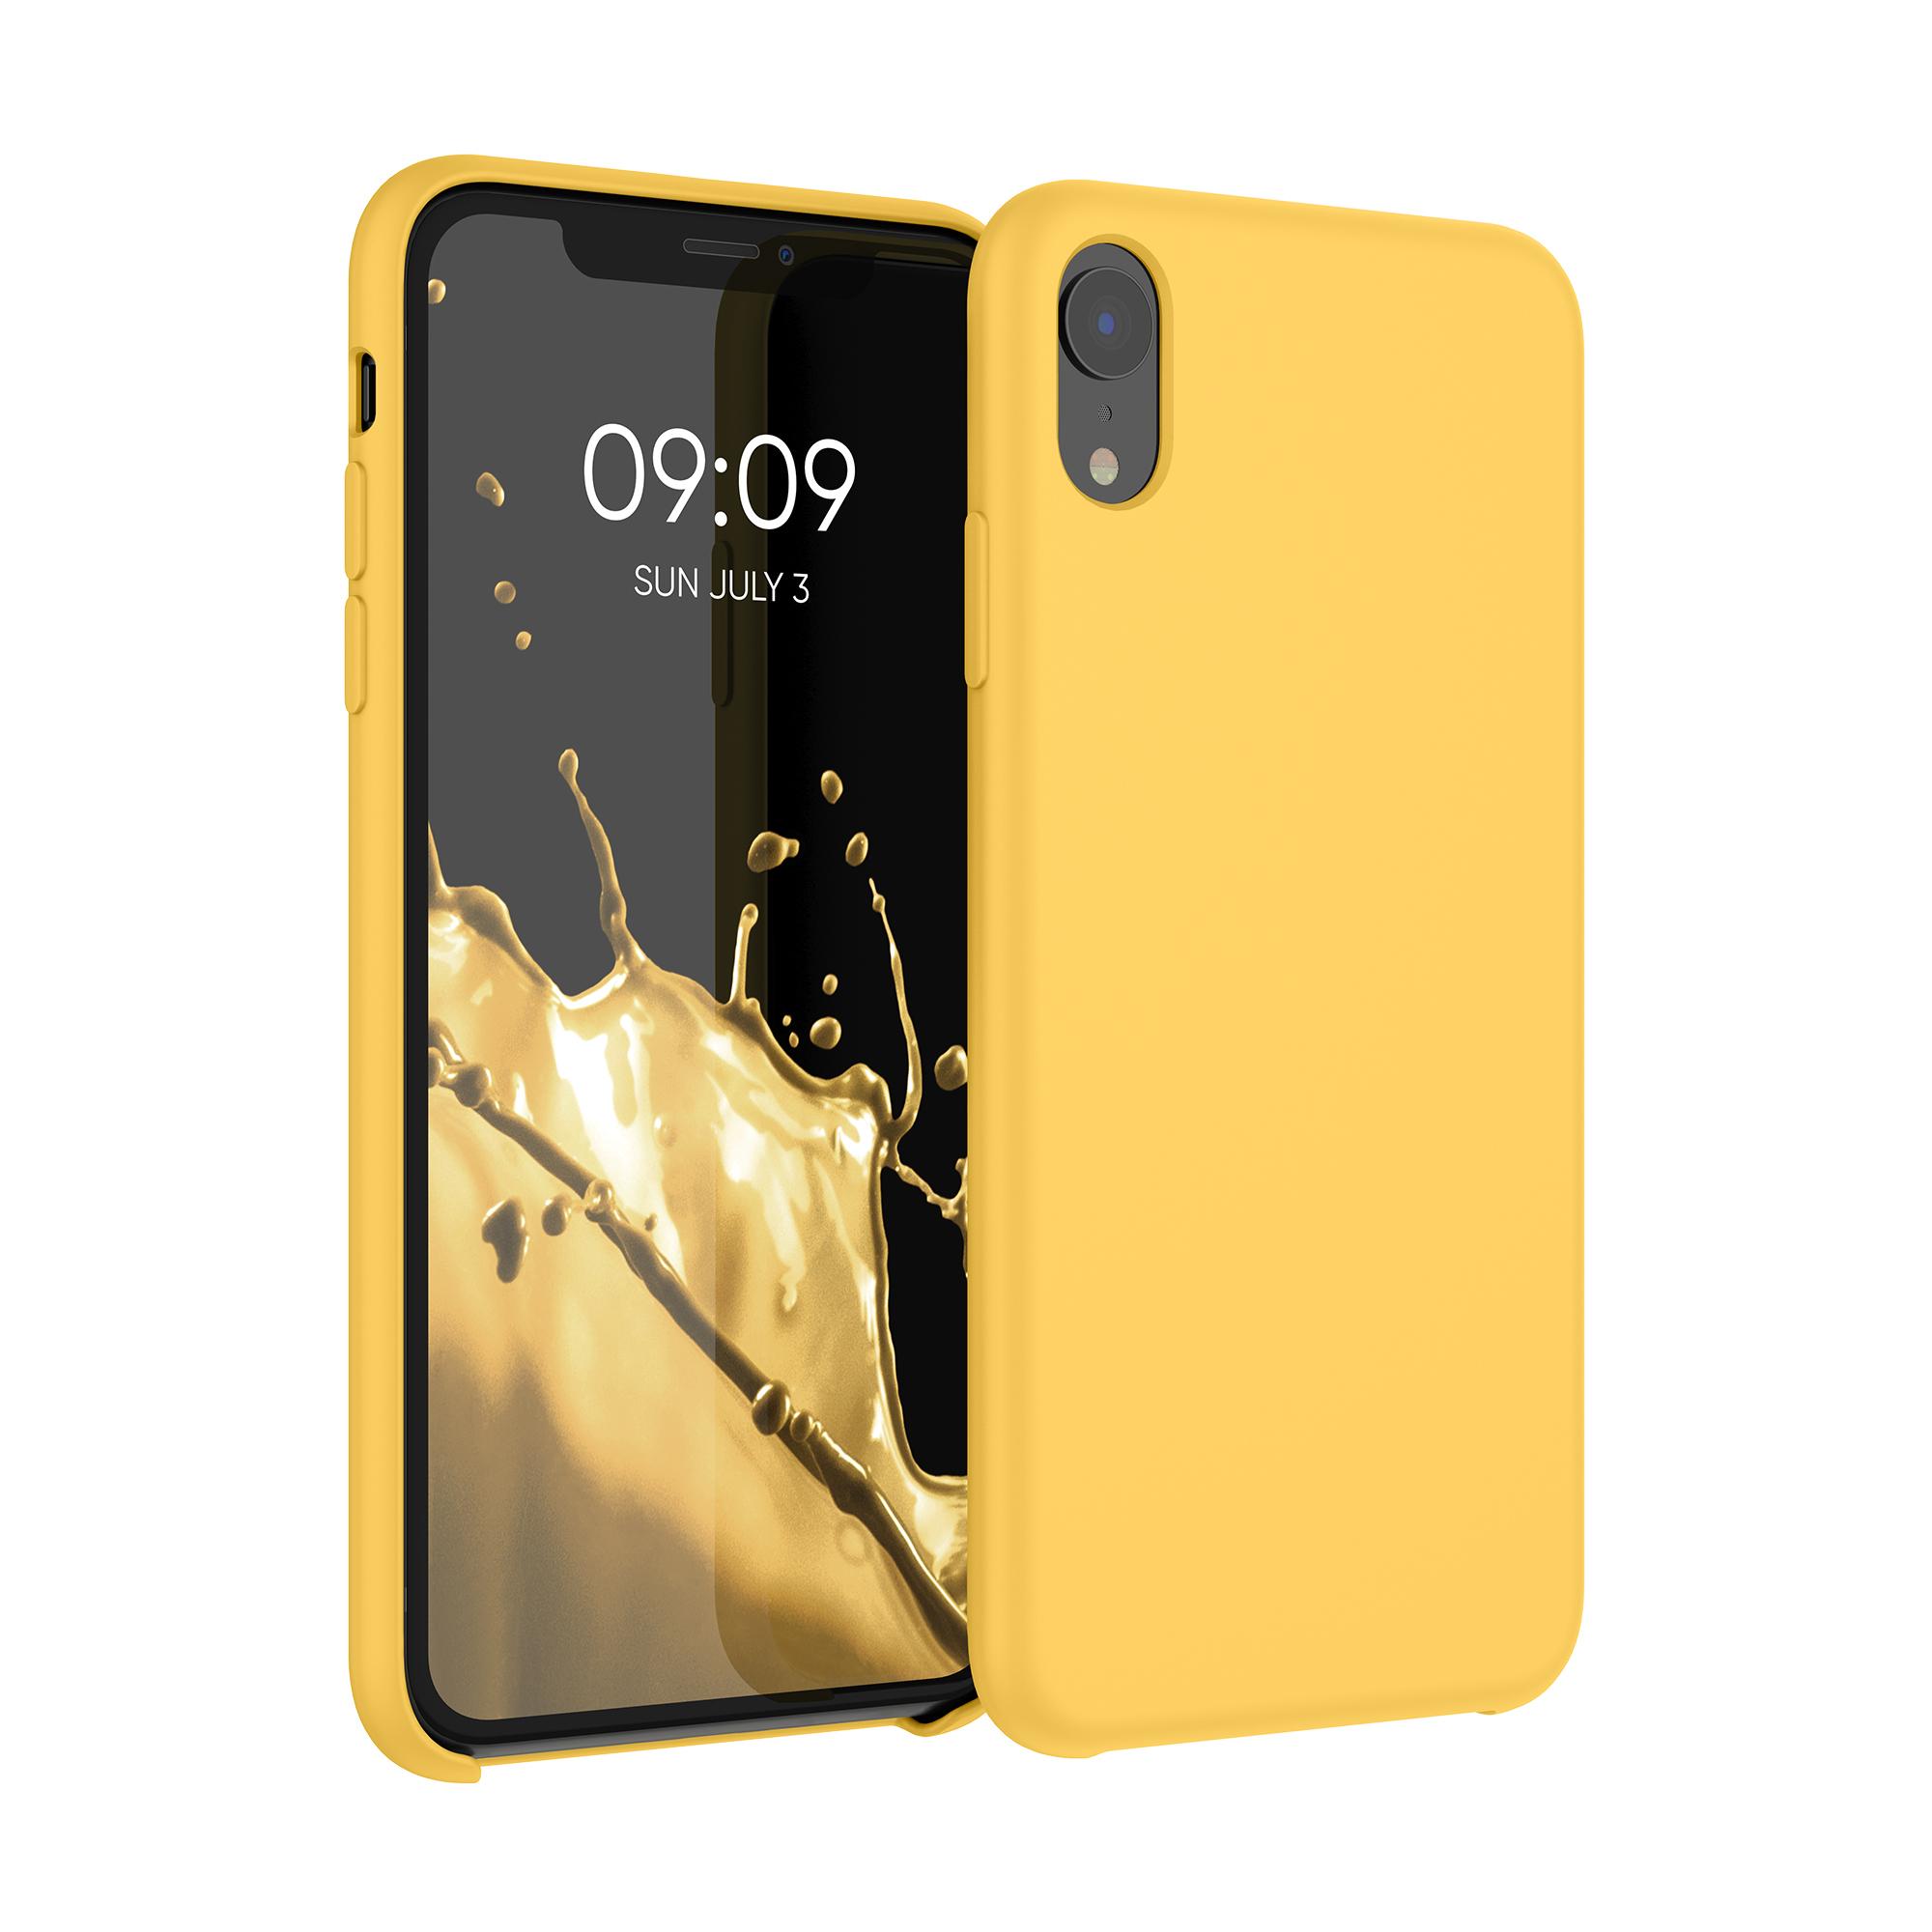 Kvalitní silikonové TPU pouzdro pro Apple iPhone XR - Saffron Yellow